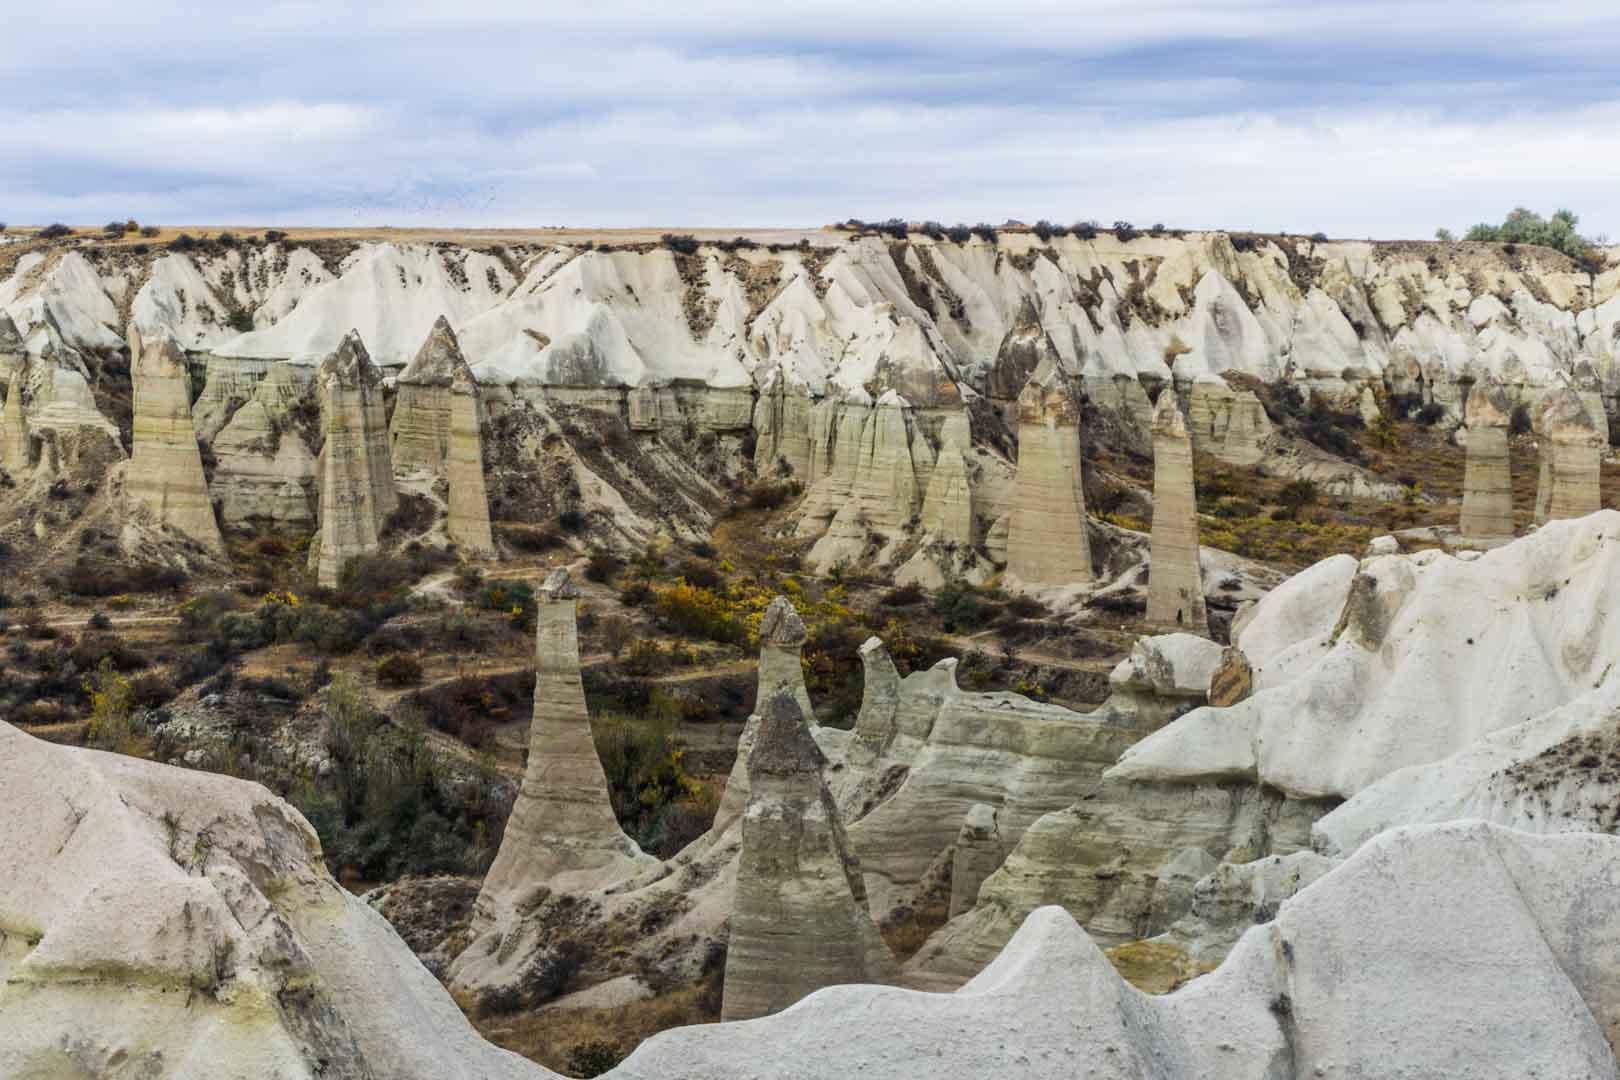 Cappadocia cappadoce turquie turkey serialhikers jul et gaux autostop volontariat hitchhiking world tour volonteering adventure aventure Pancarlık cheminées fée chimney fairy